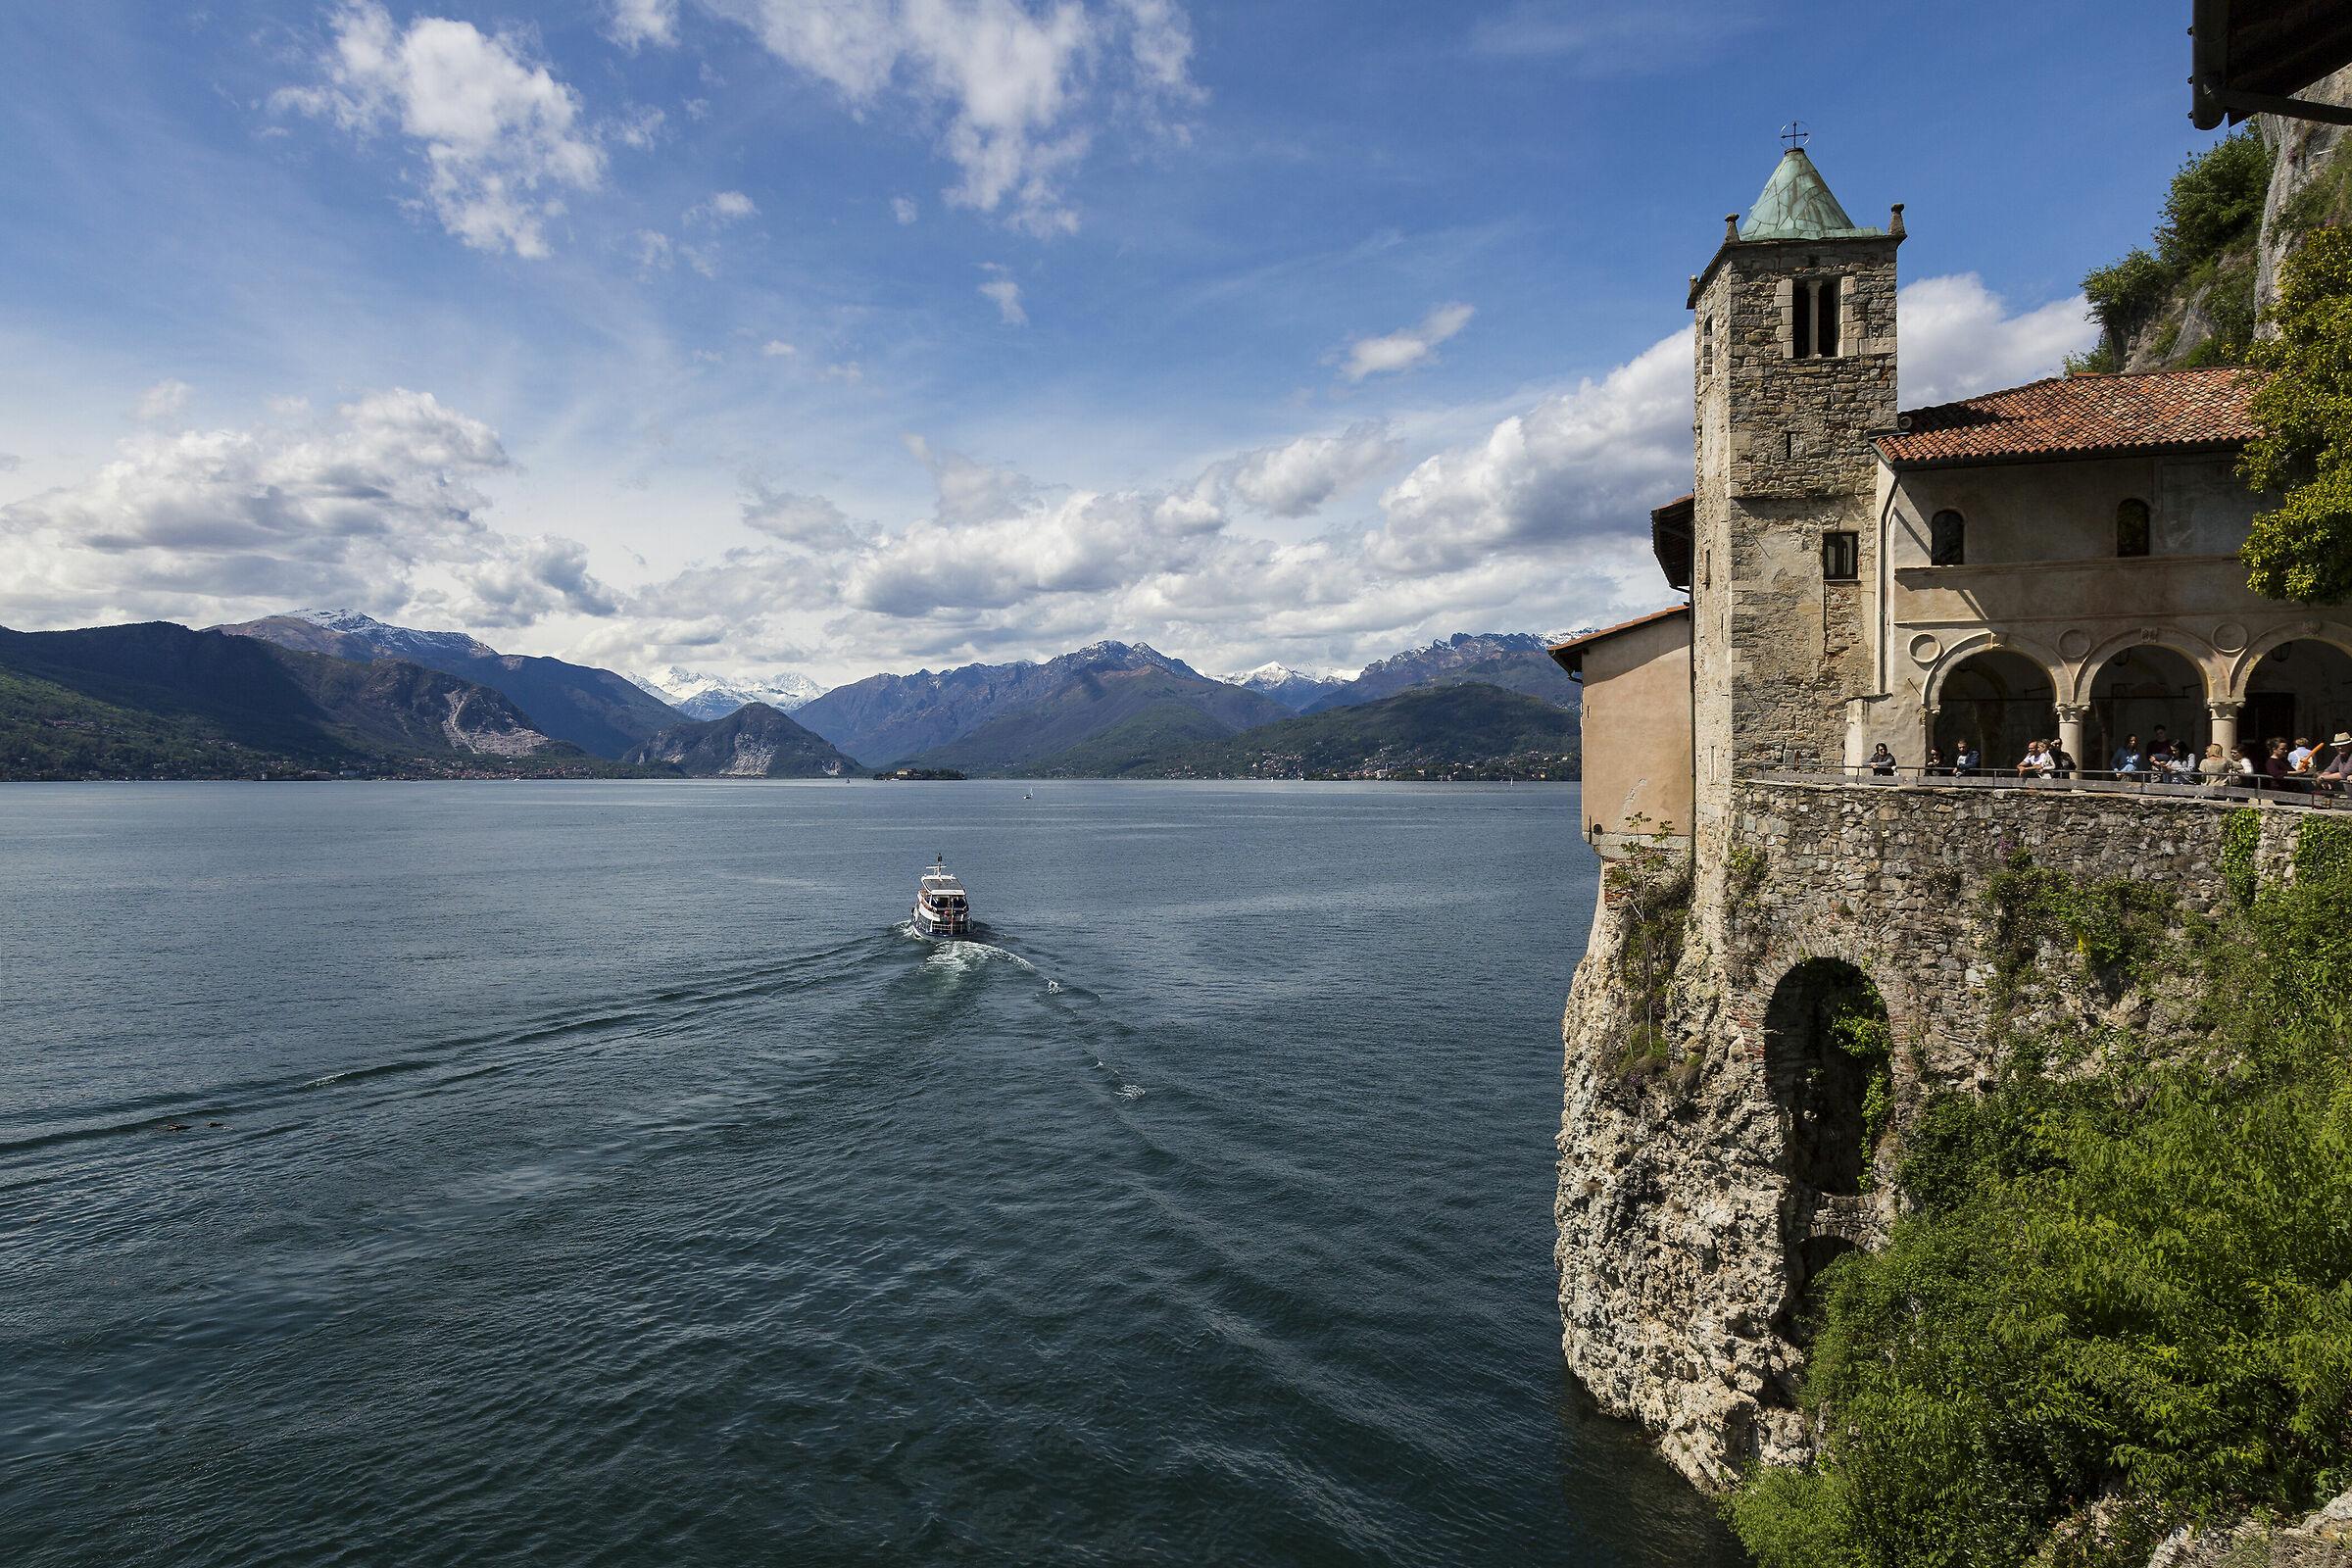 Lake Maggiore and its hermitage....